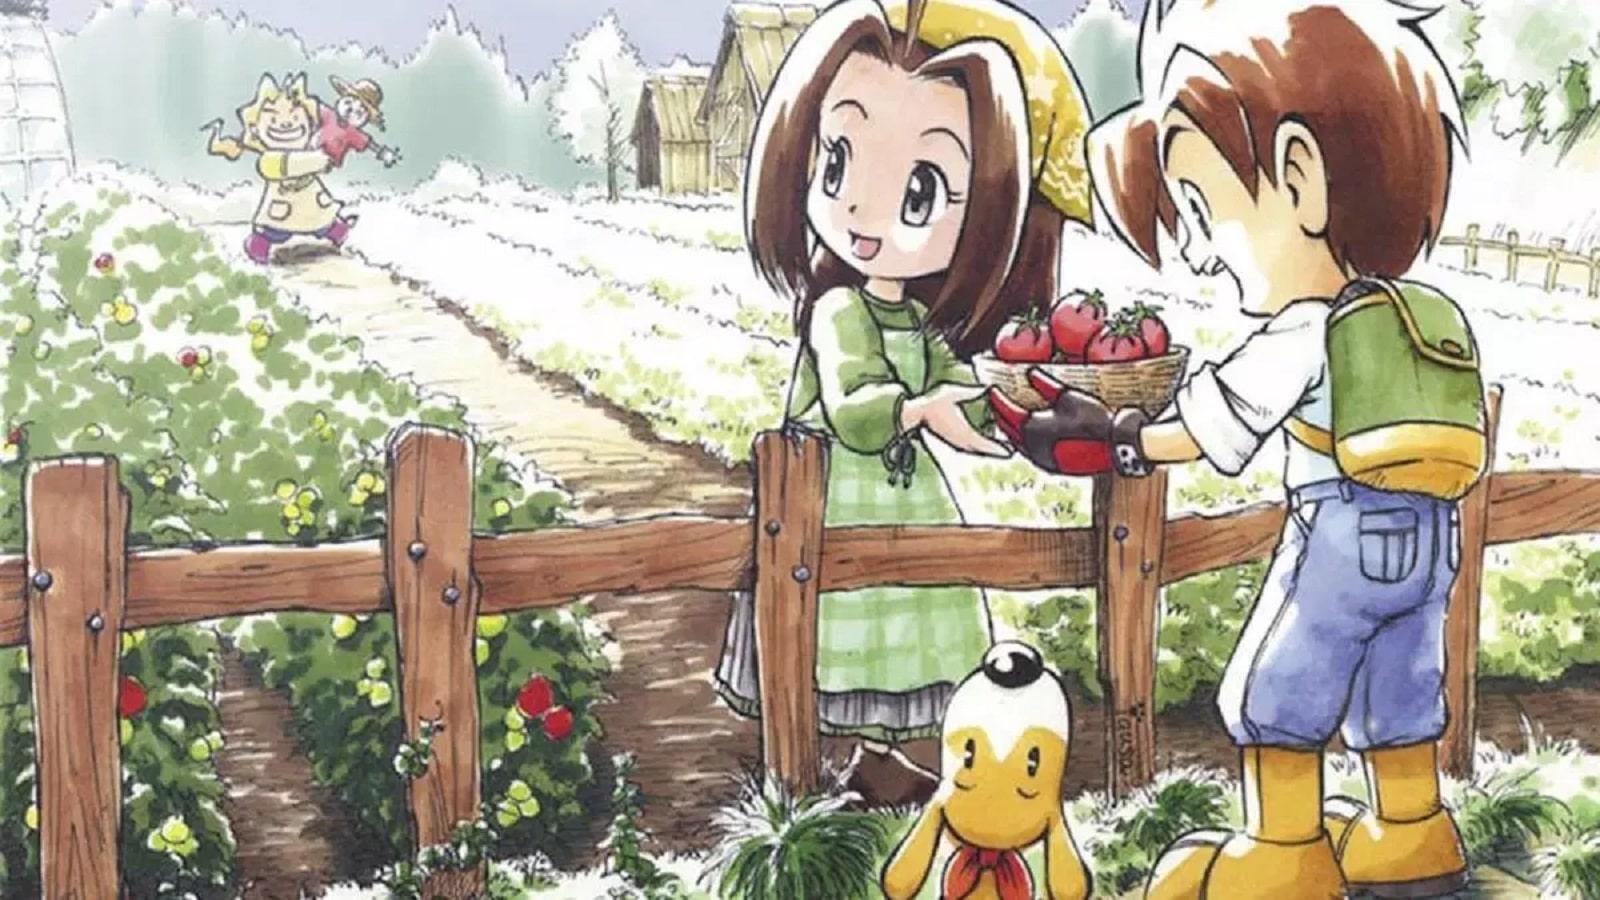 harvest moon characters on a farm